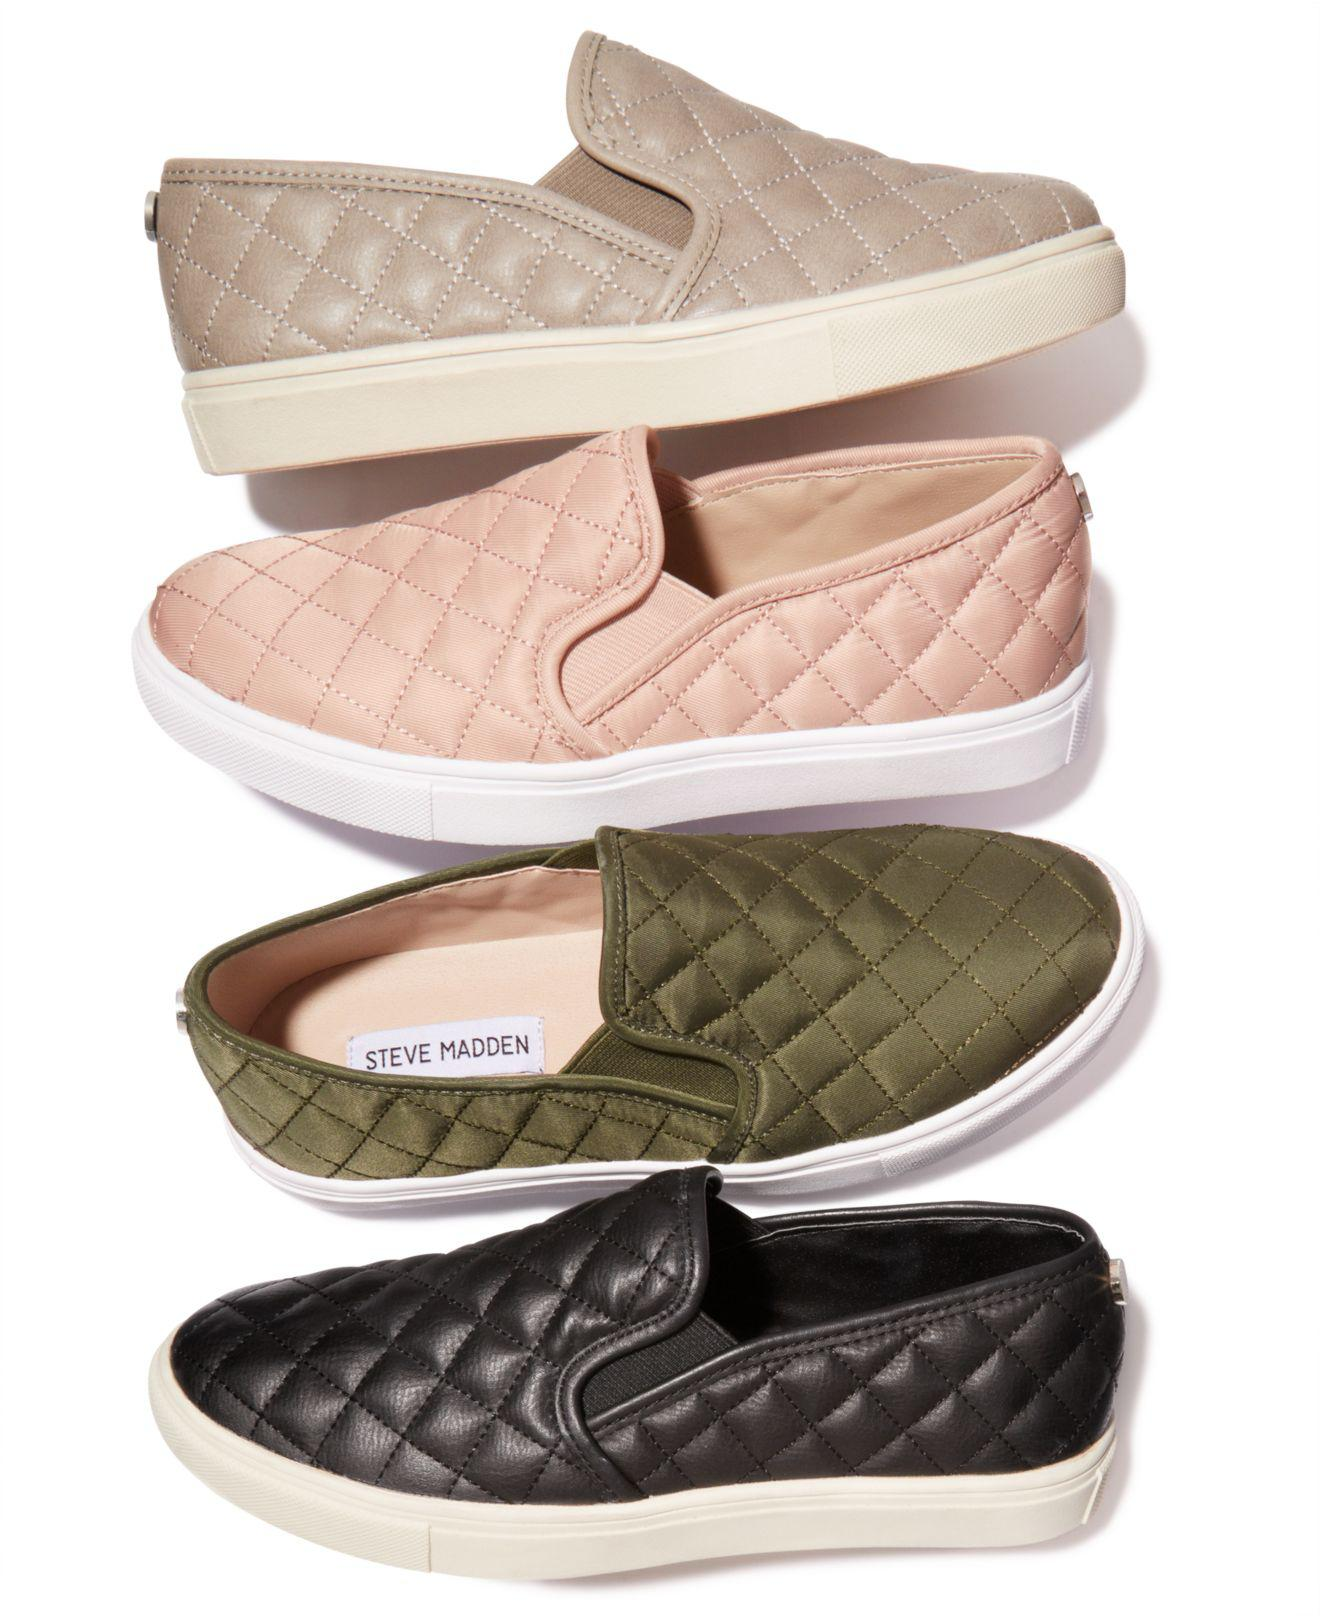 e9962601474 Steve Madden - Black Ecentrc-q Platform Sneakers - Lyst. View fullscreen